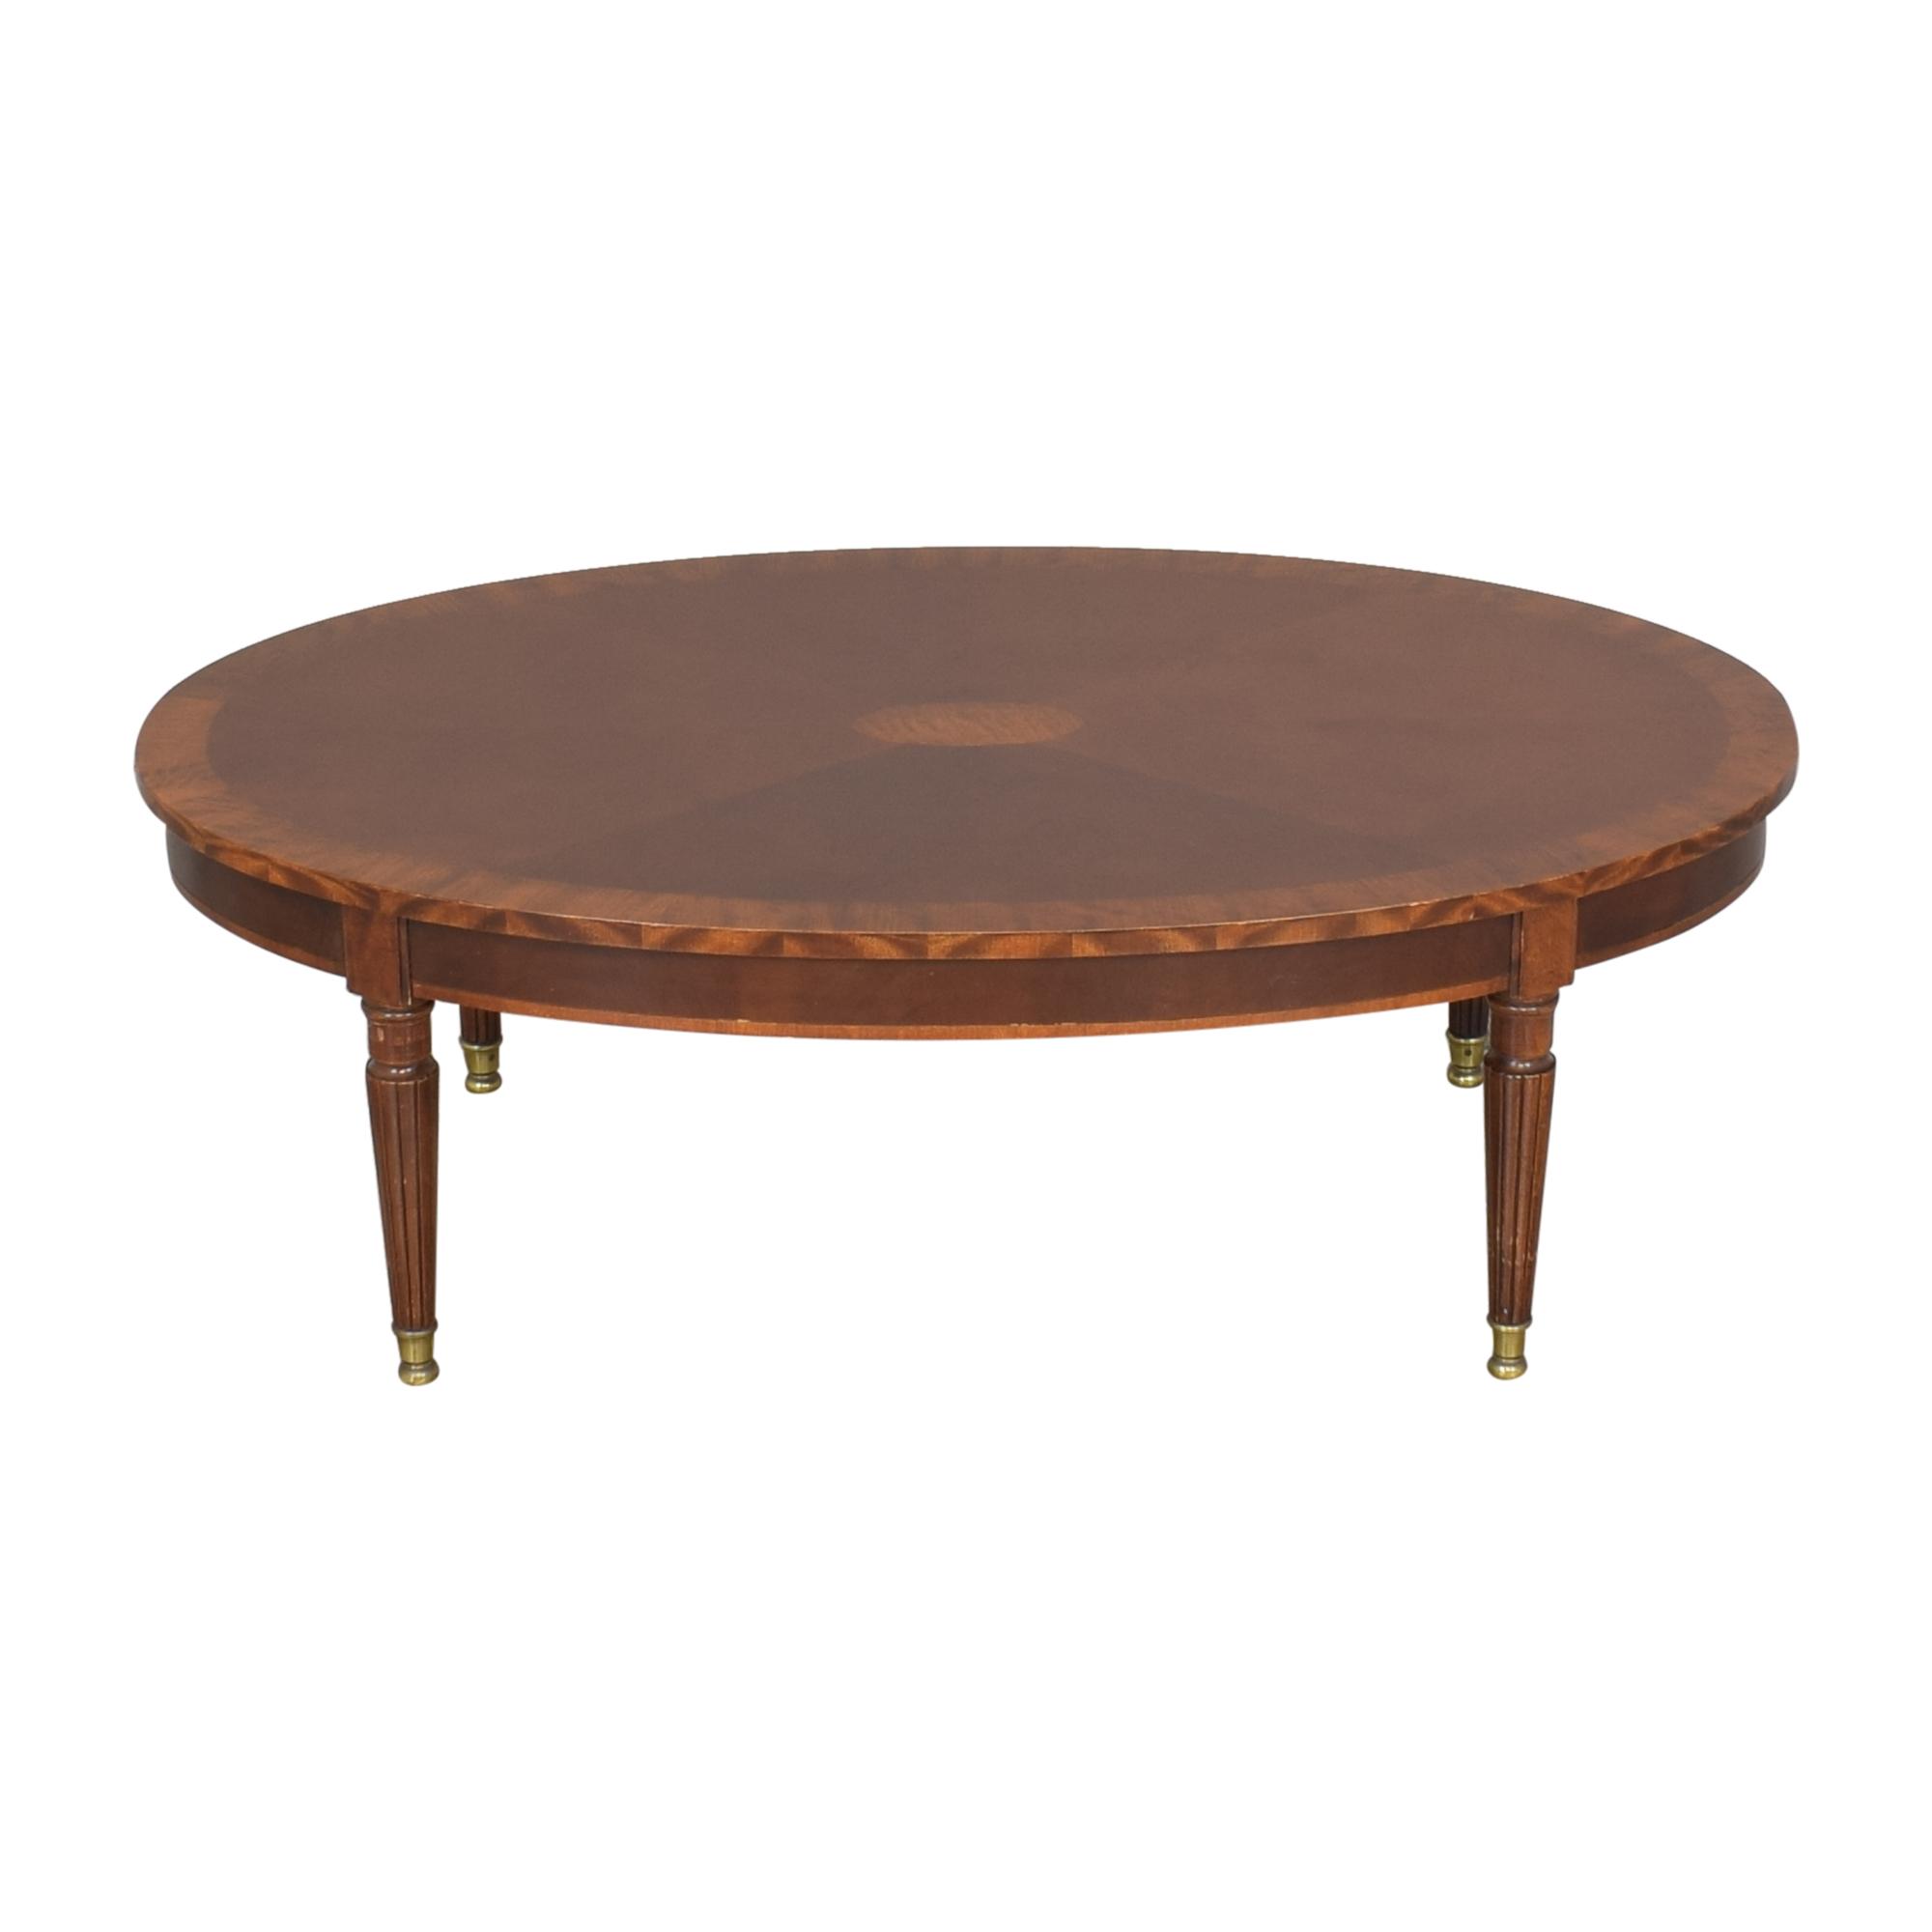 Henredon Furniture Henredon Oval Coffee Table ma